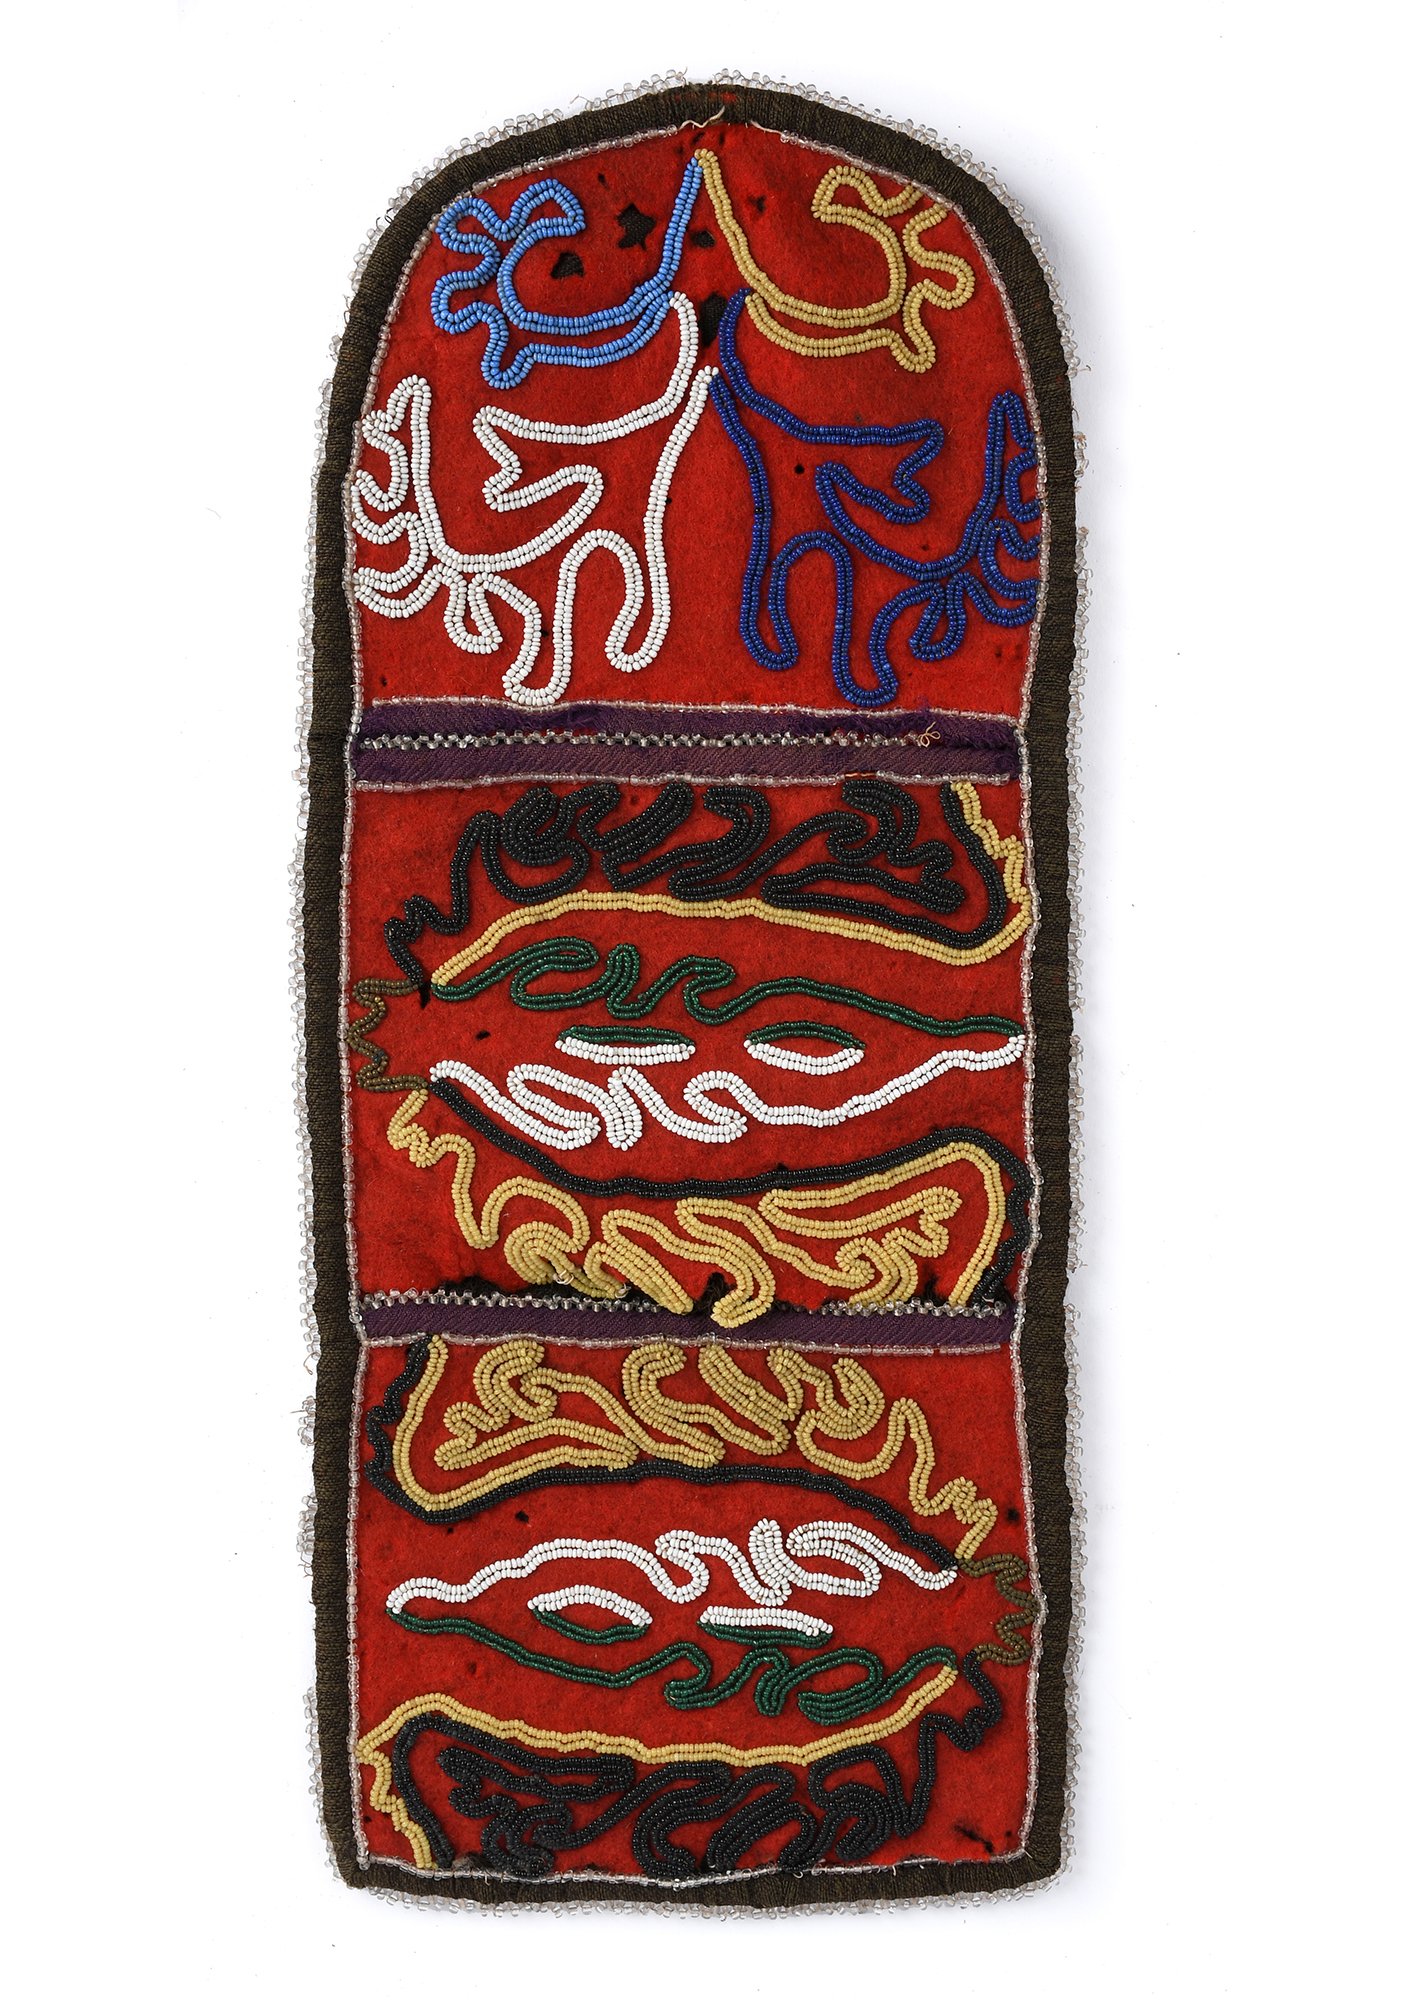 Native American Tlingit Beaded wall pocket